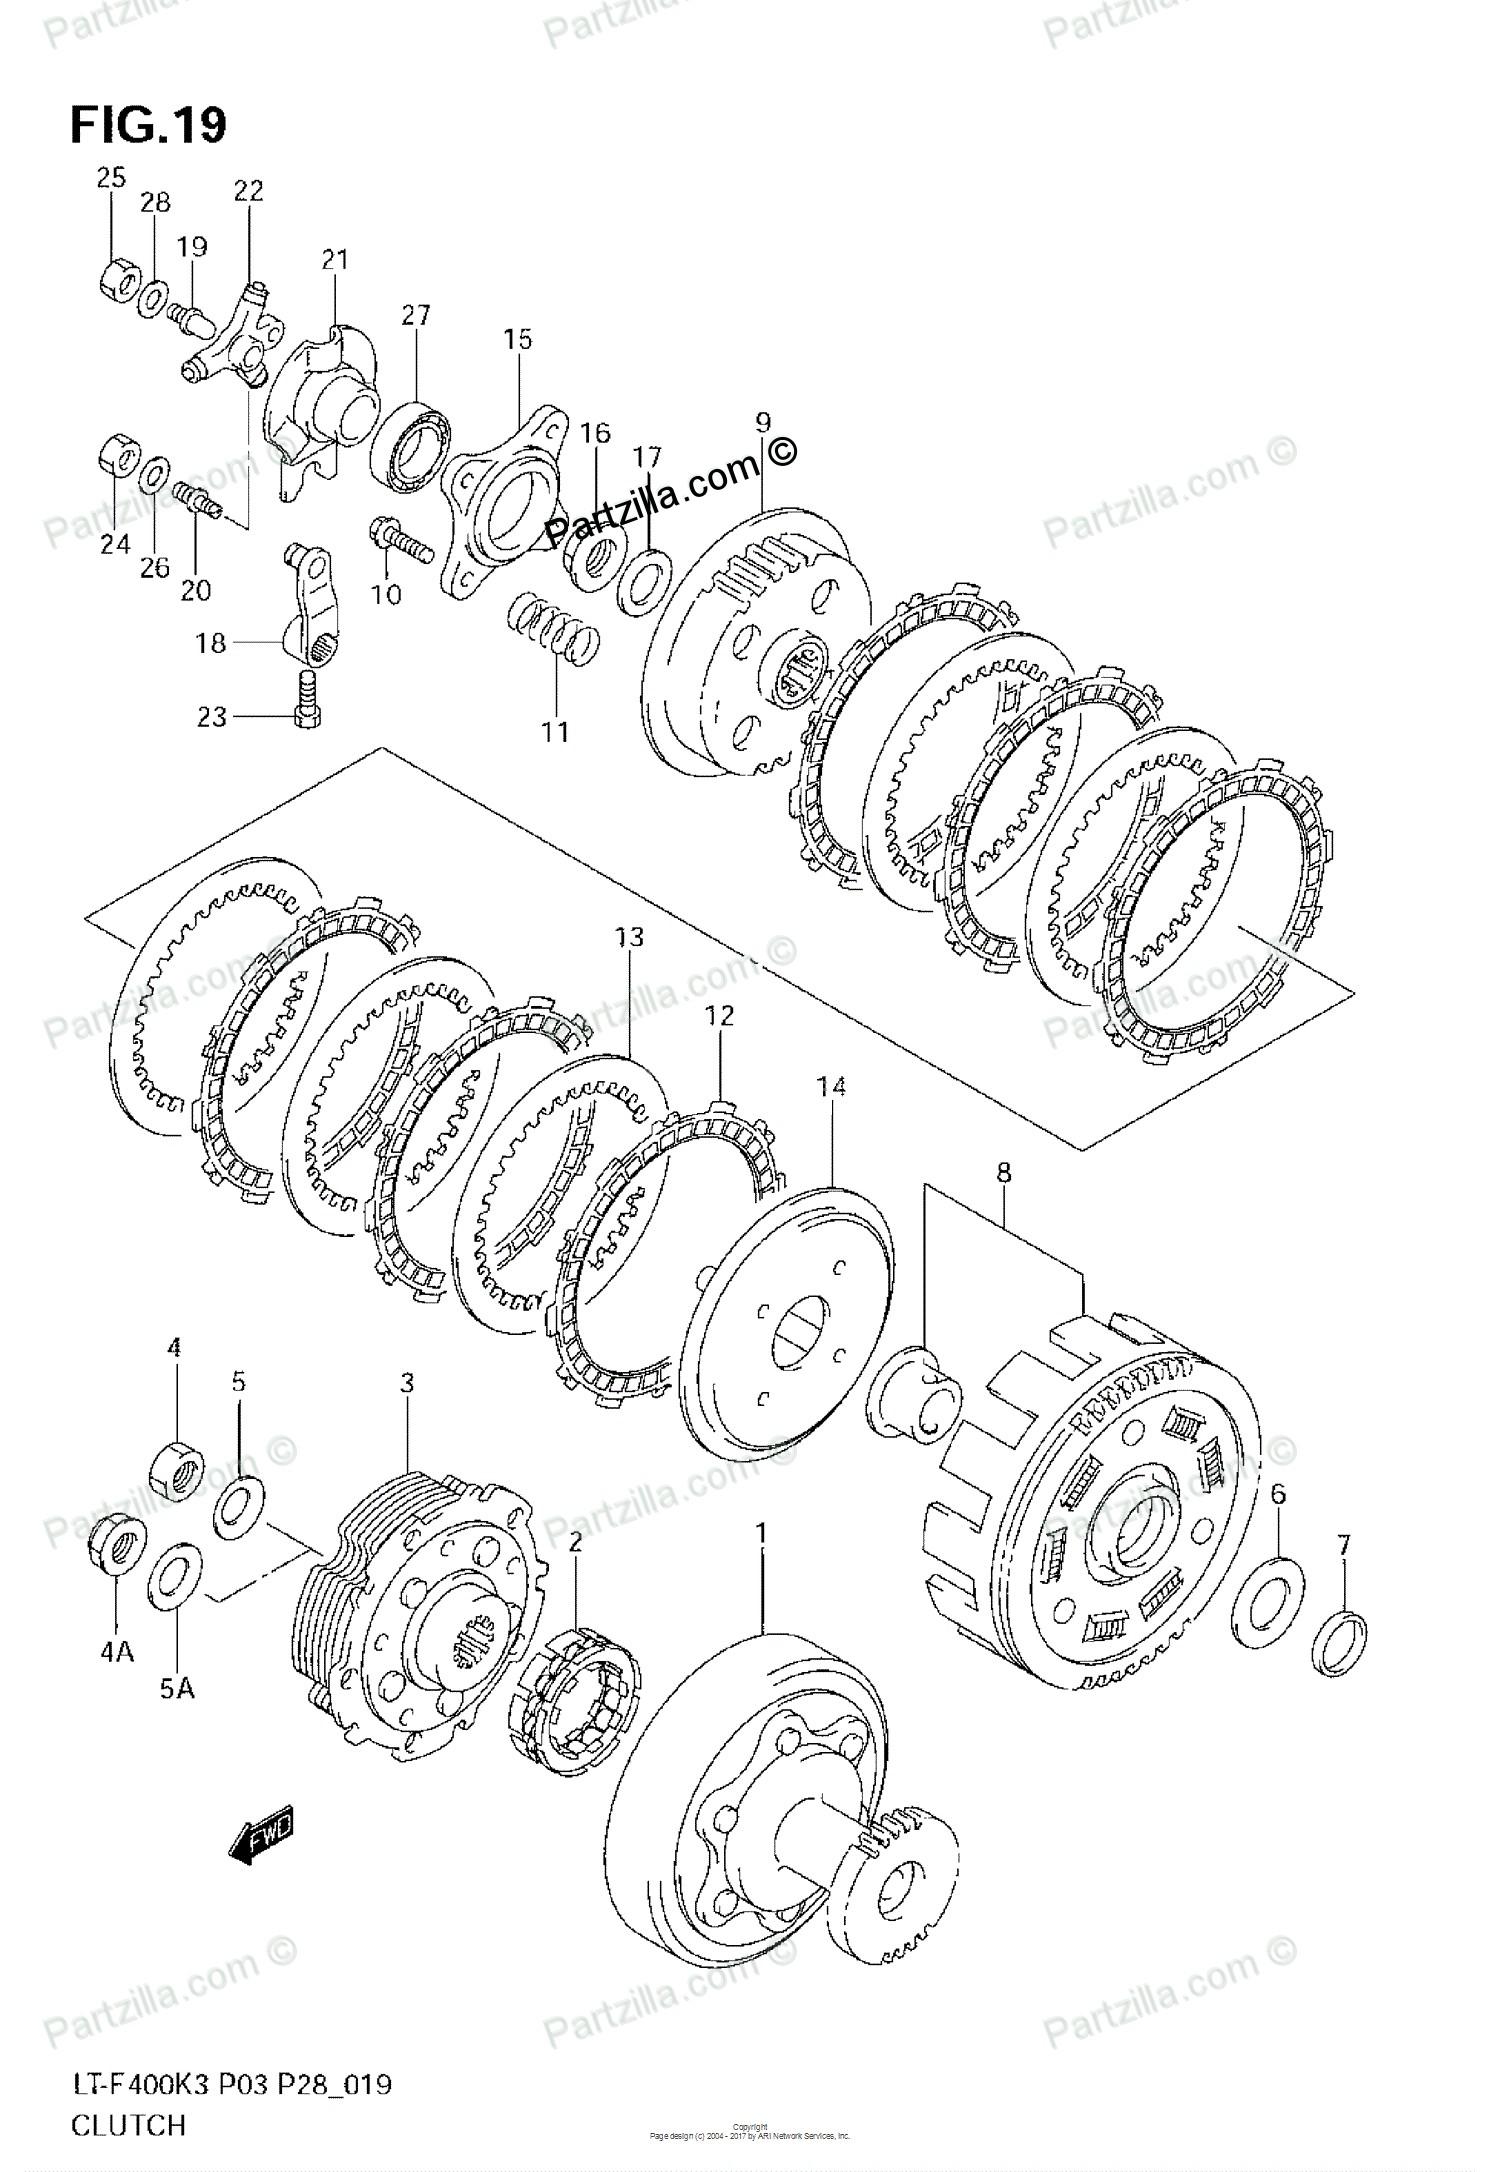 Clutch parts diagram suzuki atv 2004 oem parts diagram for clutch model k3 partzilla